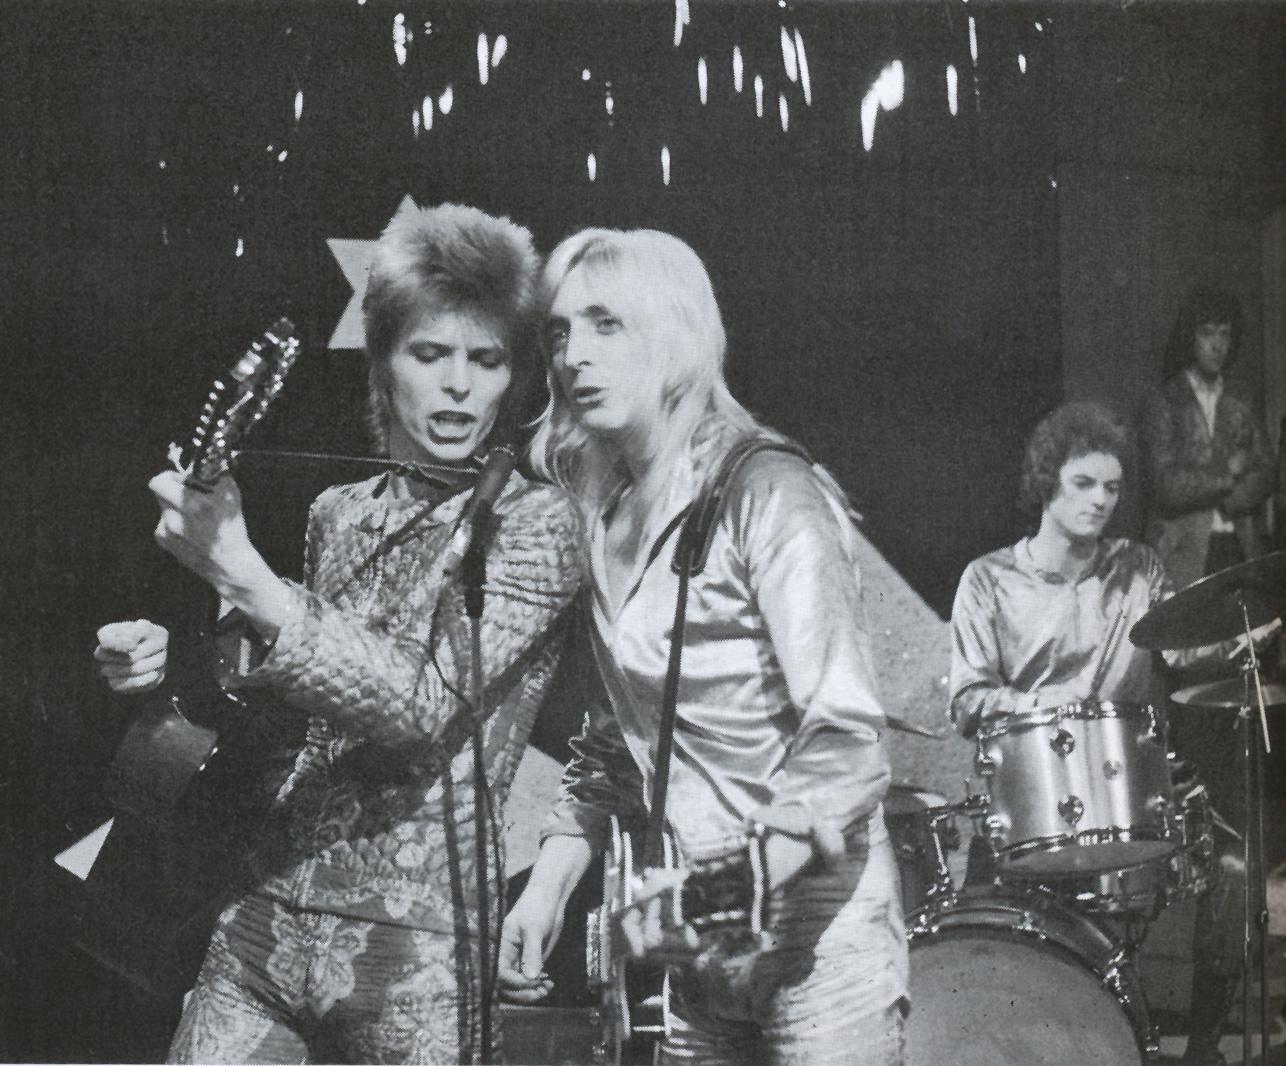 Ziggy Stardust and The Spiders from Mars en la BBC (a la derecha de Bowie, Mick Ronson), julio, 1972